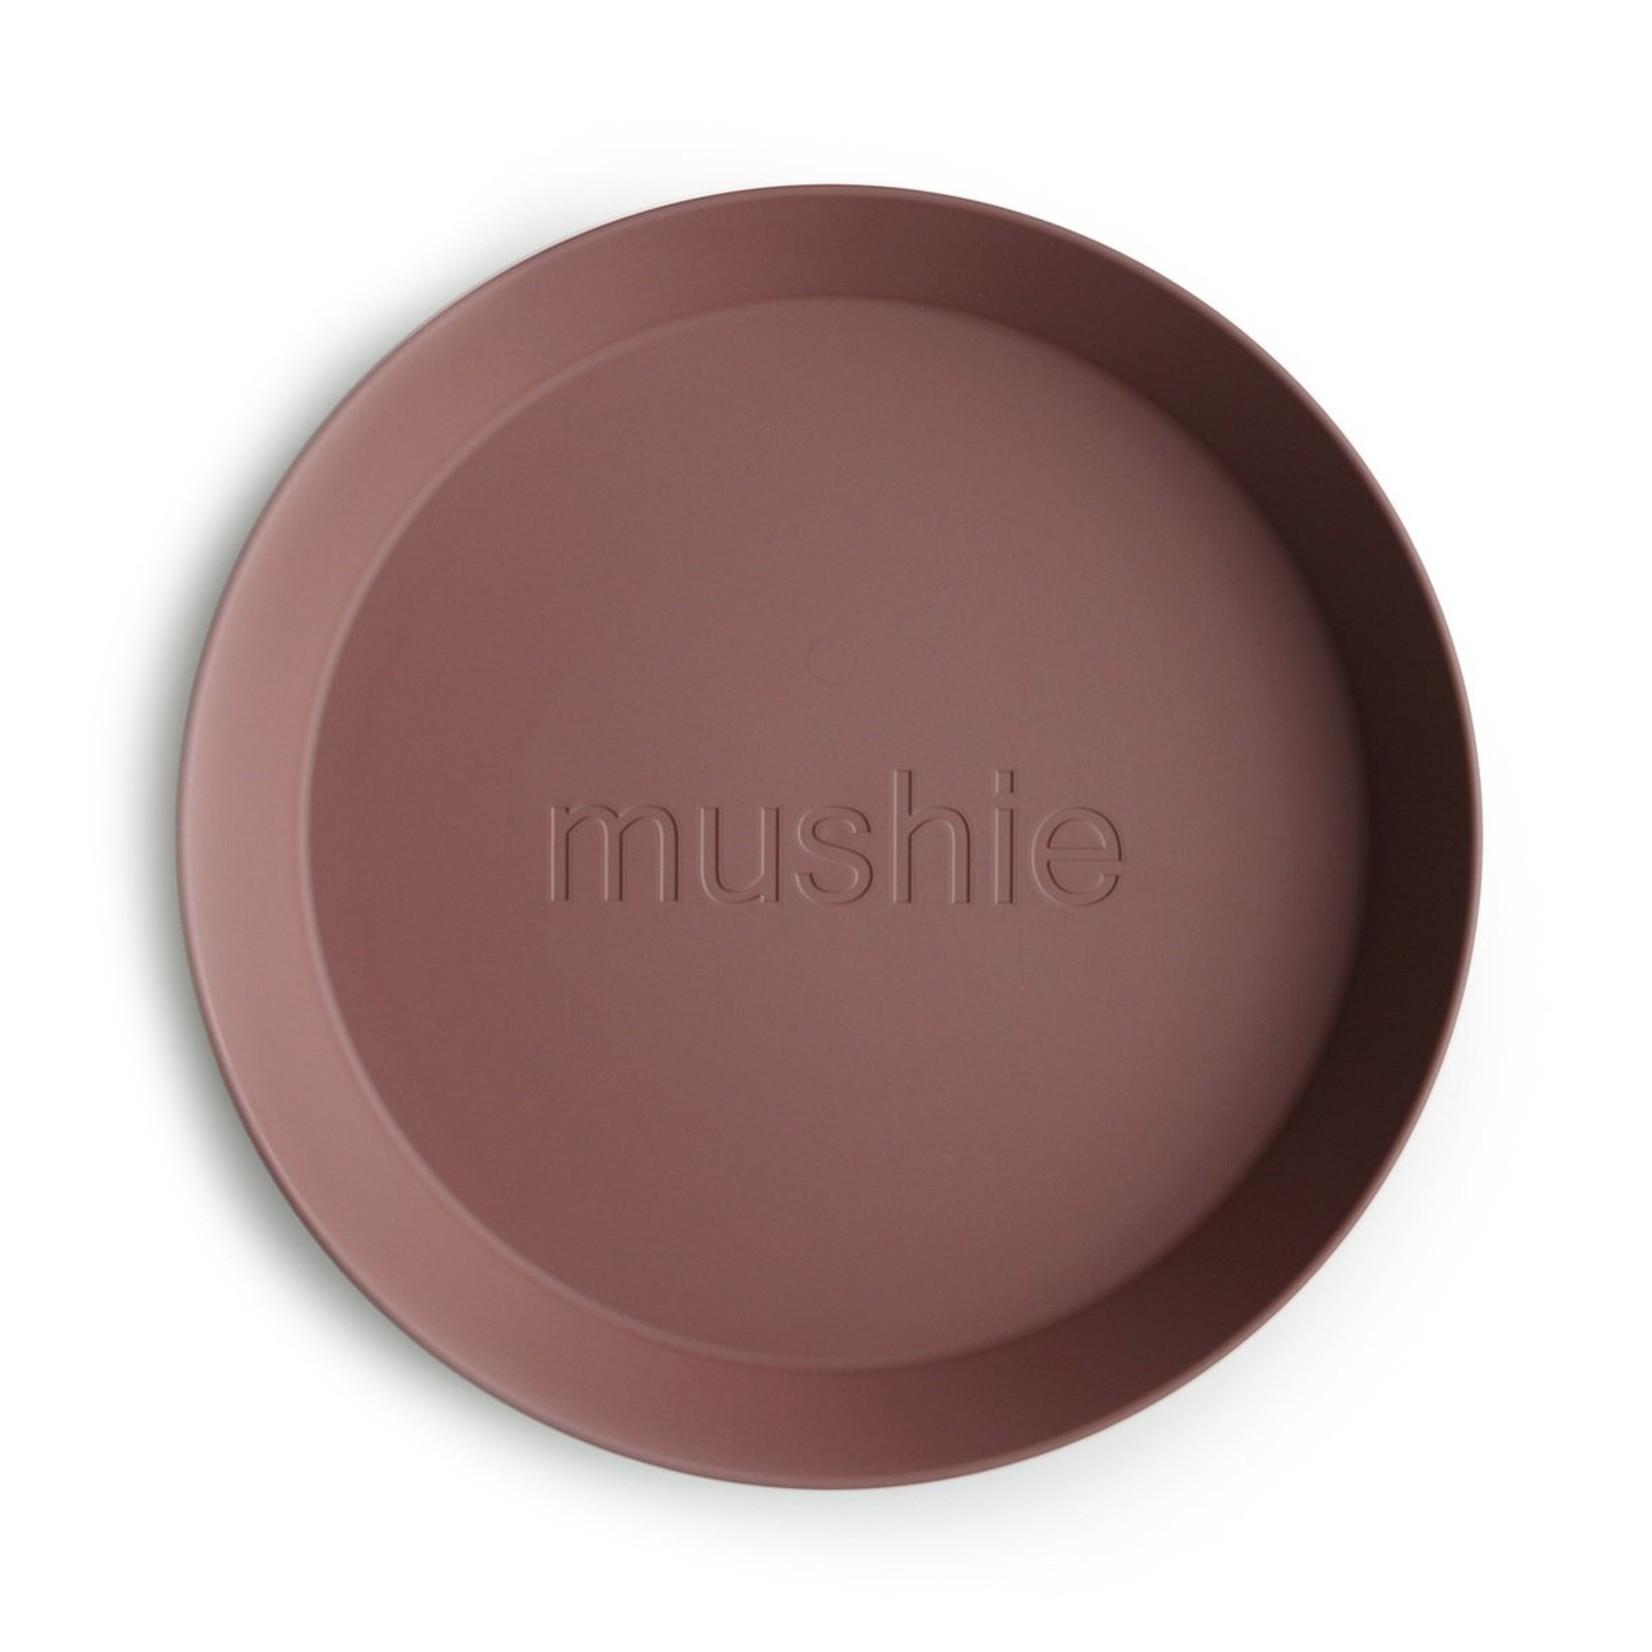 Mushie Borden 2 stuks (Woodchuck)